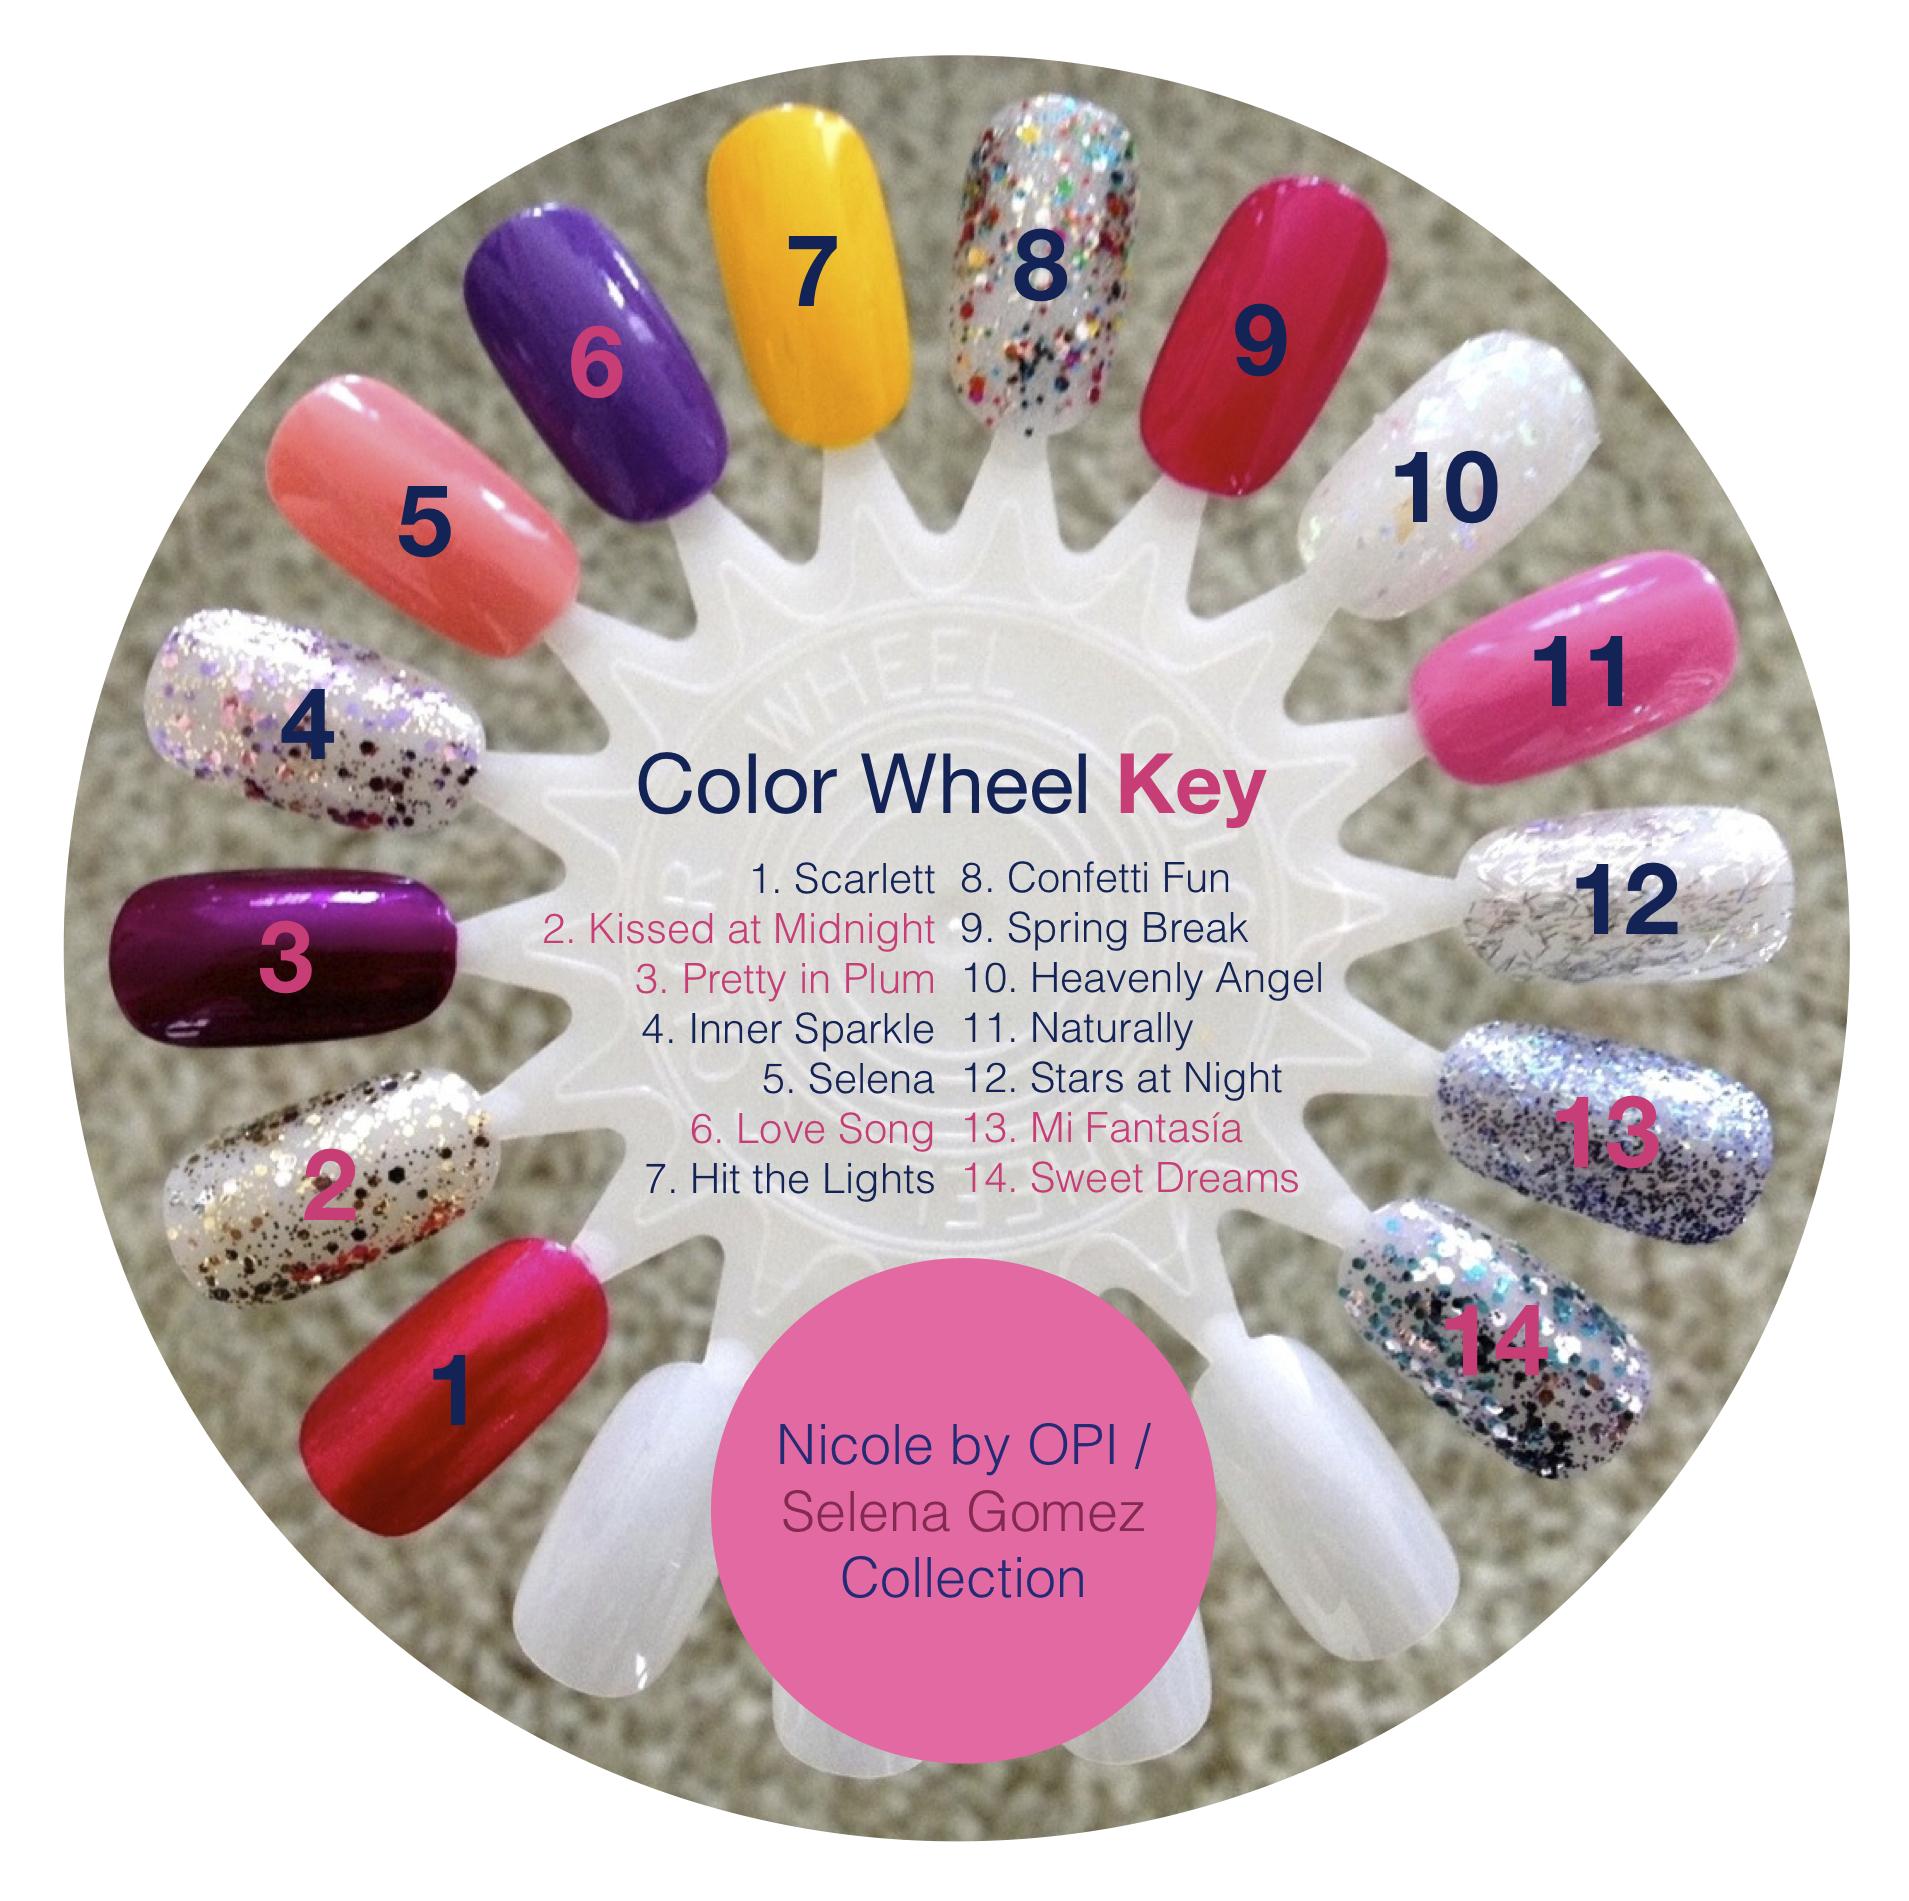 selena gomez_complete color wheel